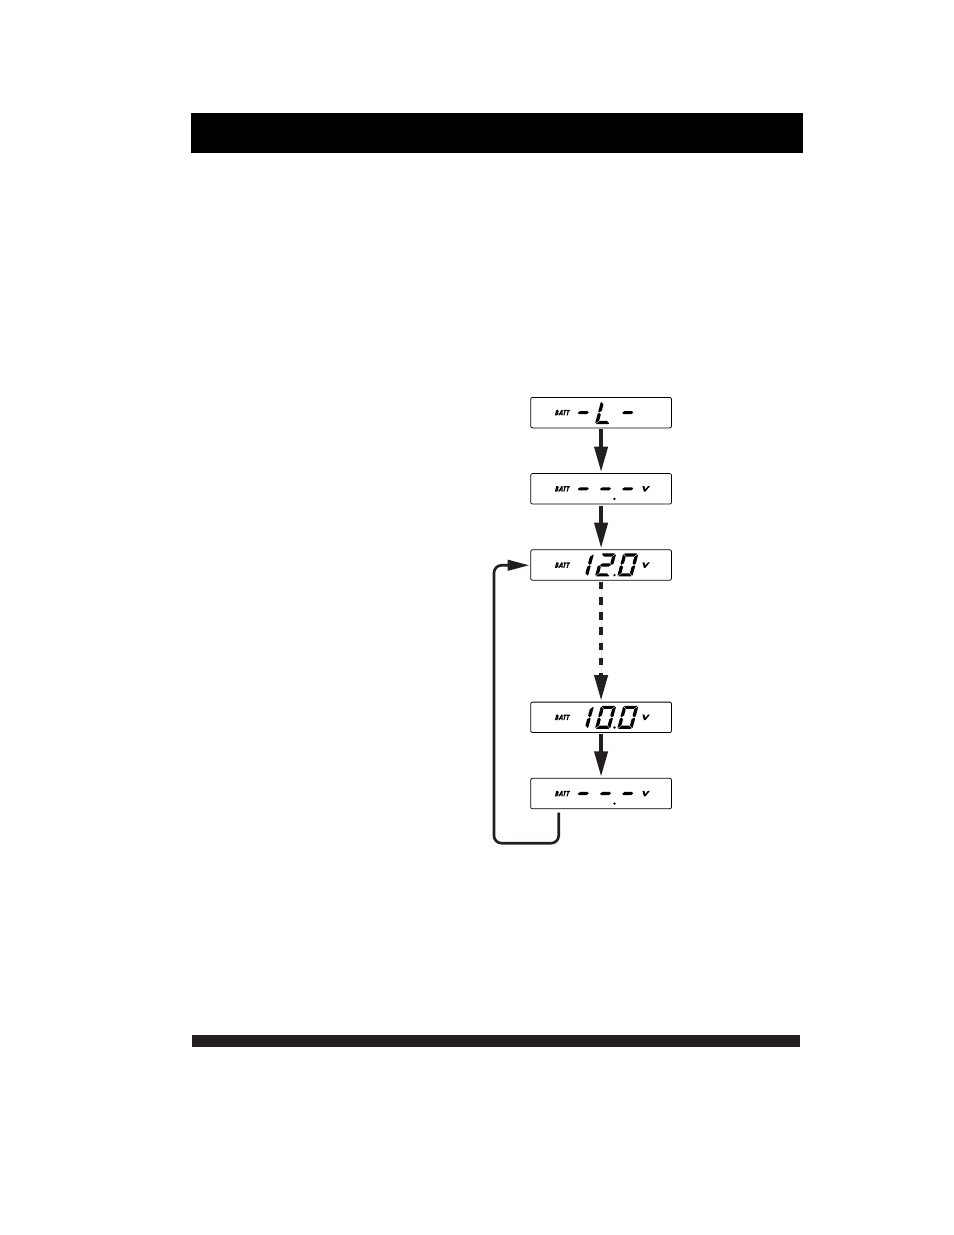 timer wiring diagram blitz fatt dc turbo